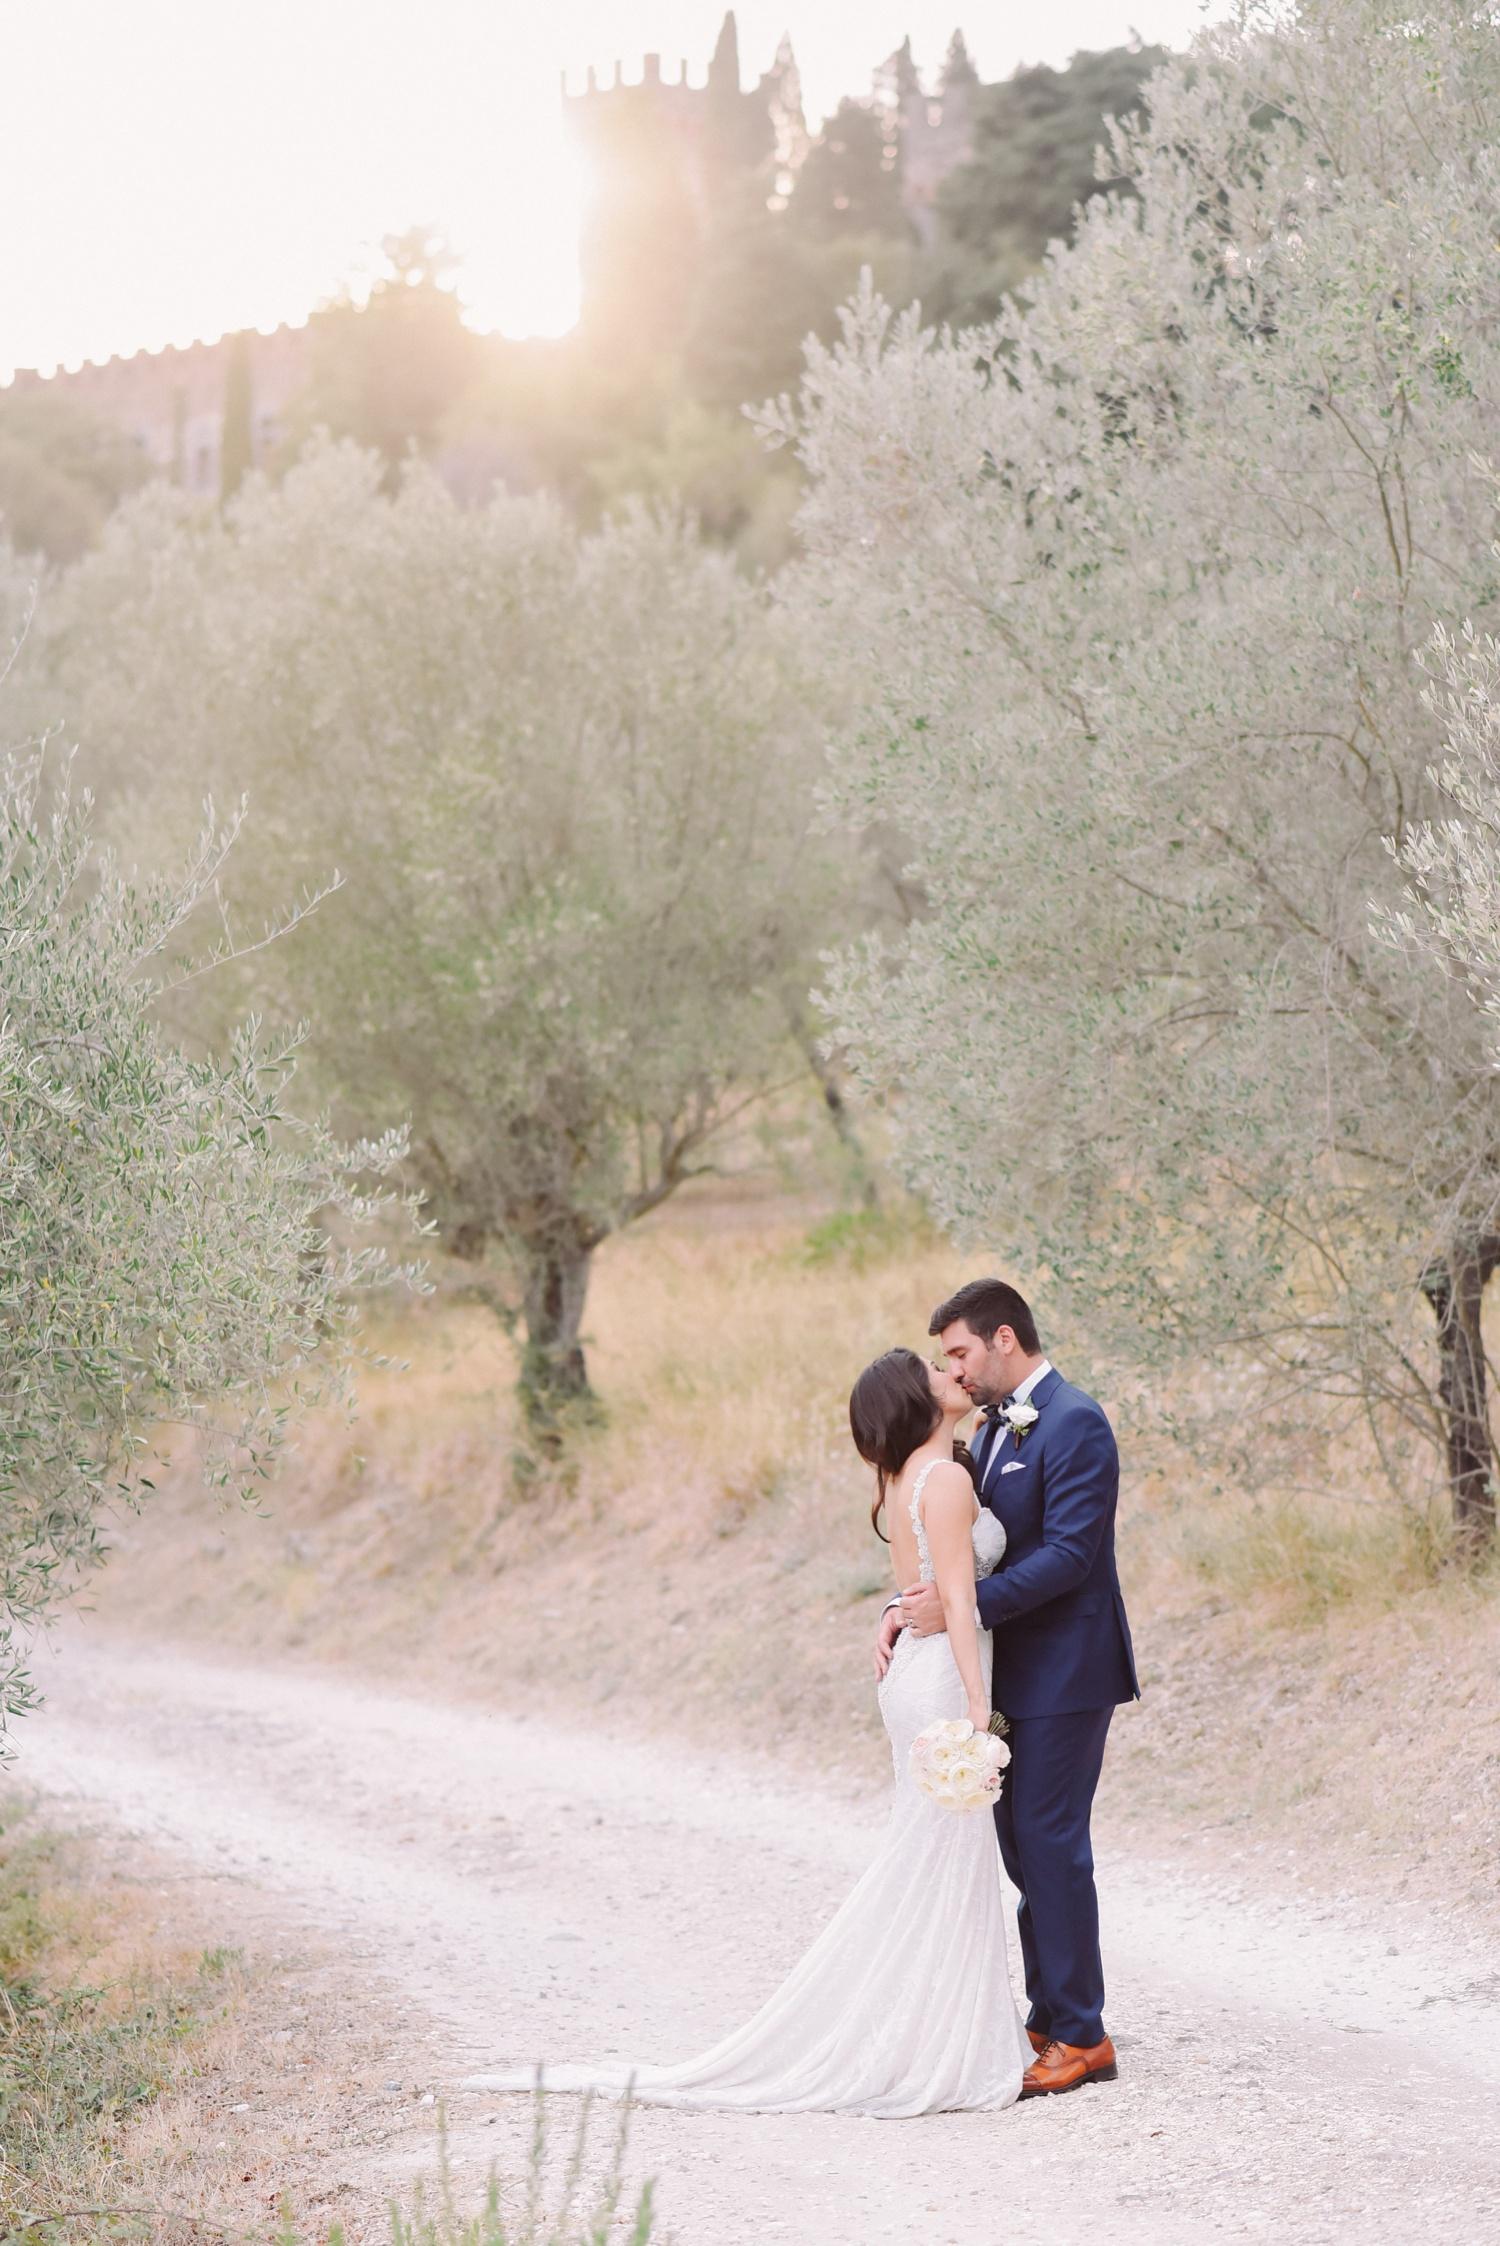 wedding-photographer-florence-vincigliata-tuscany_1102.jpg